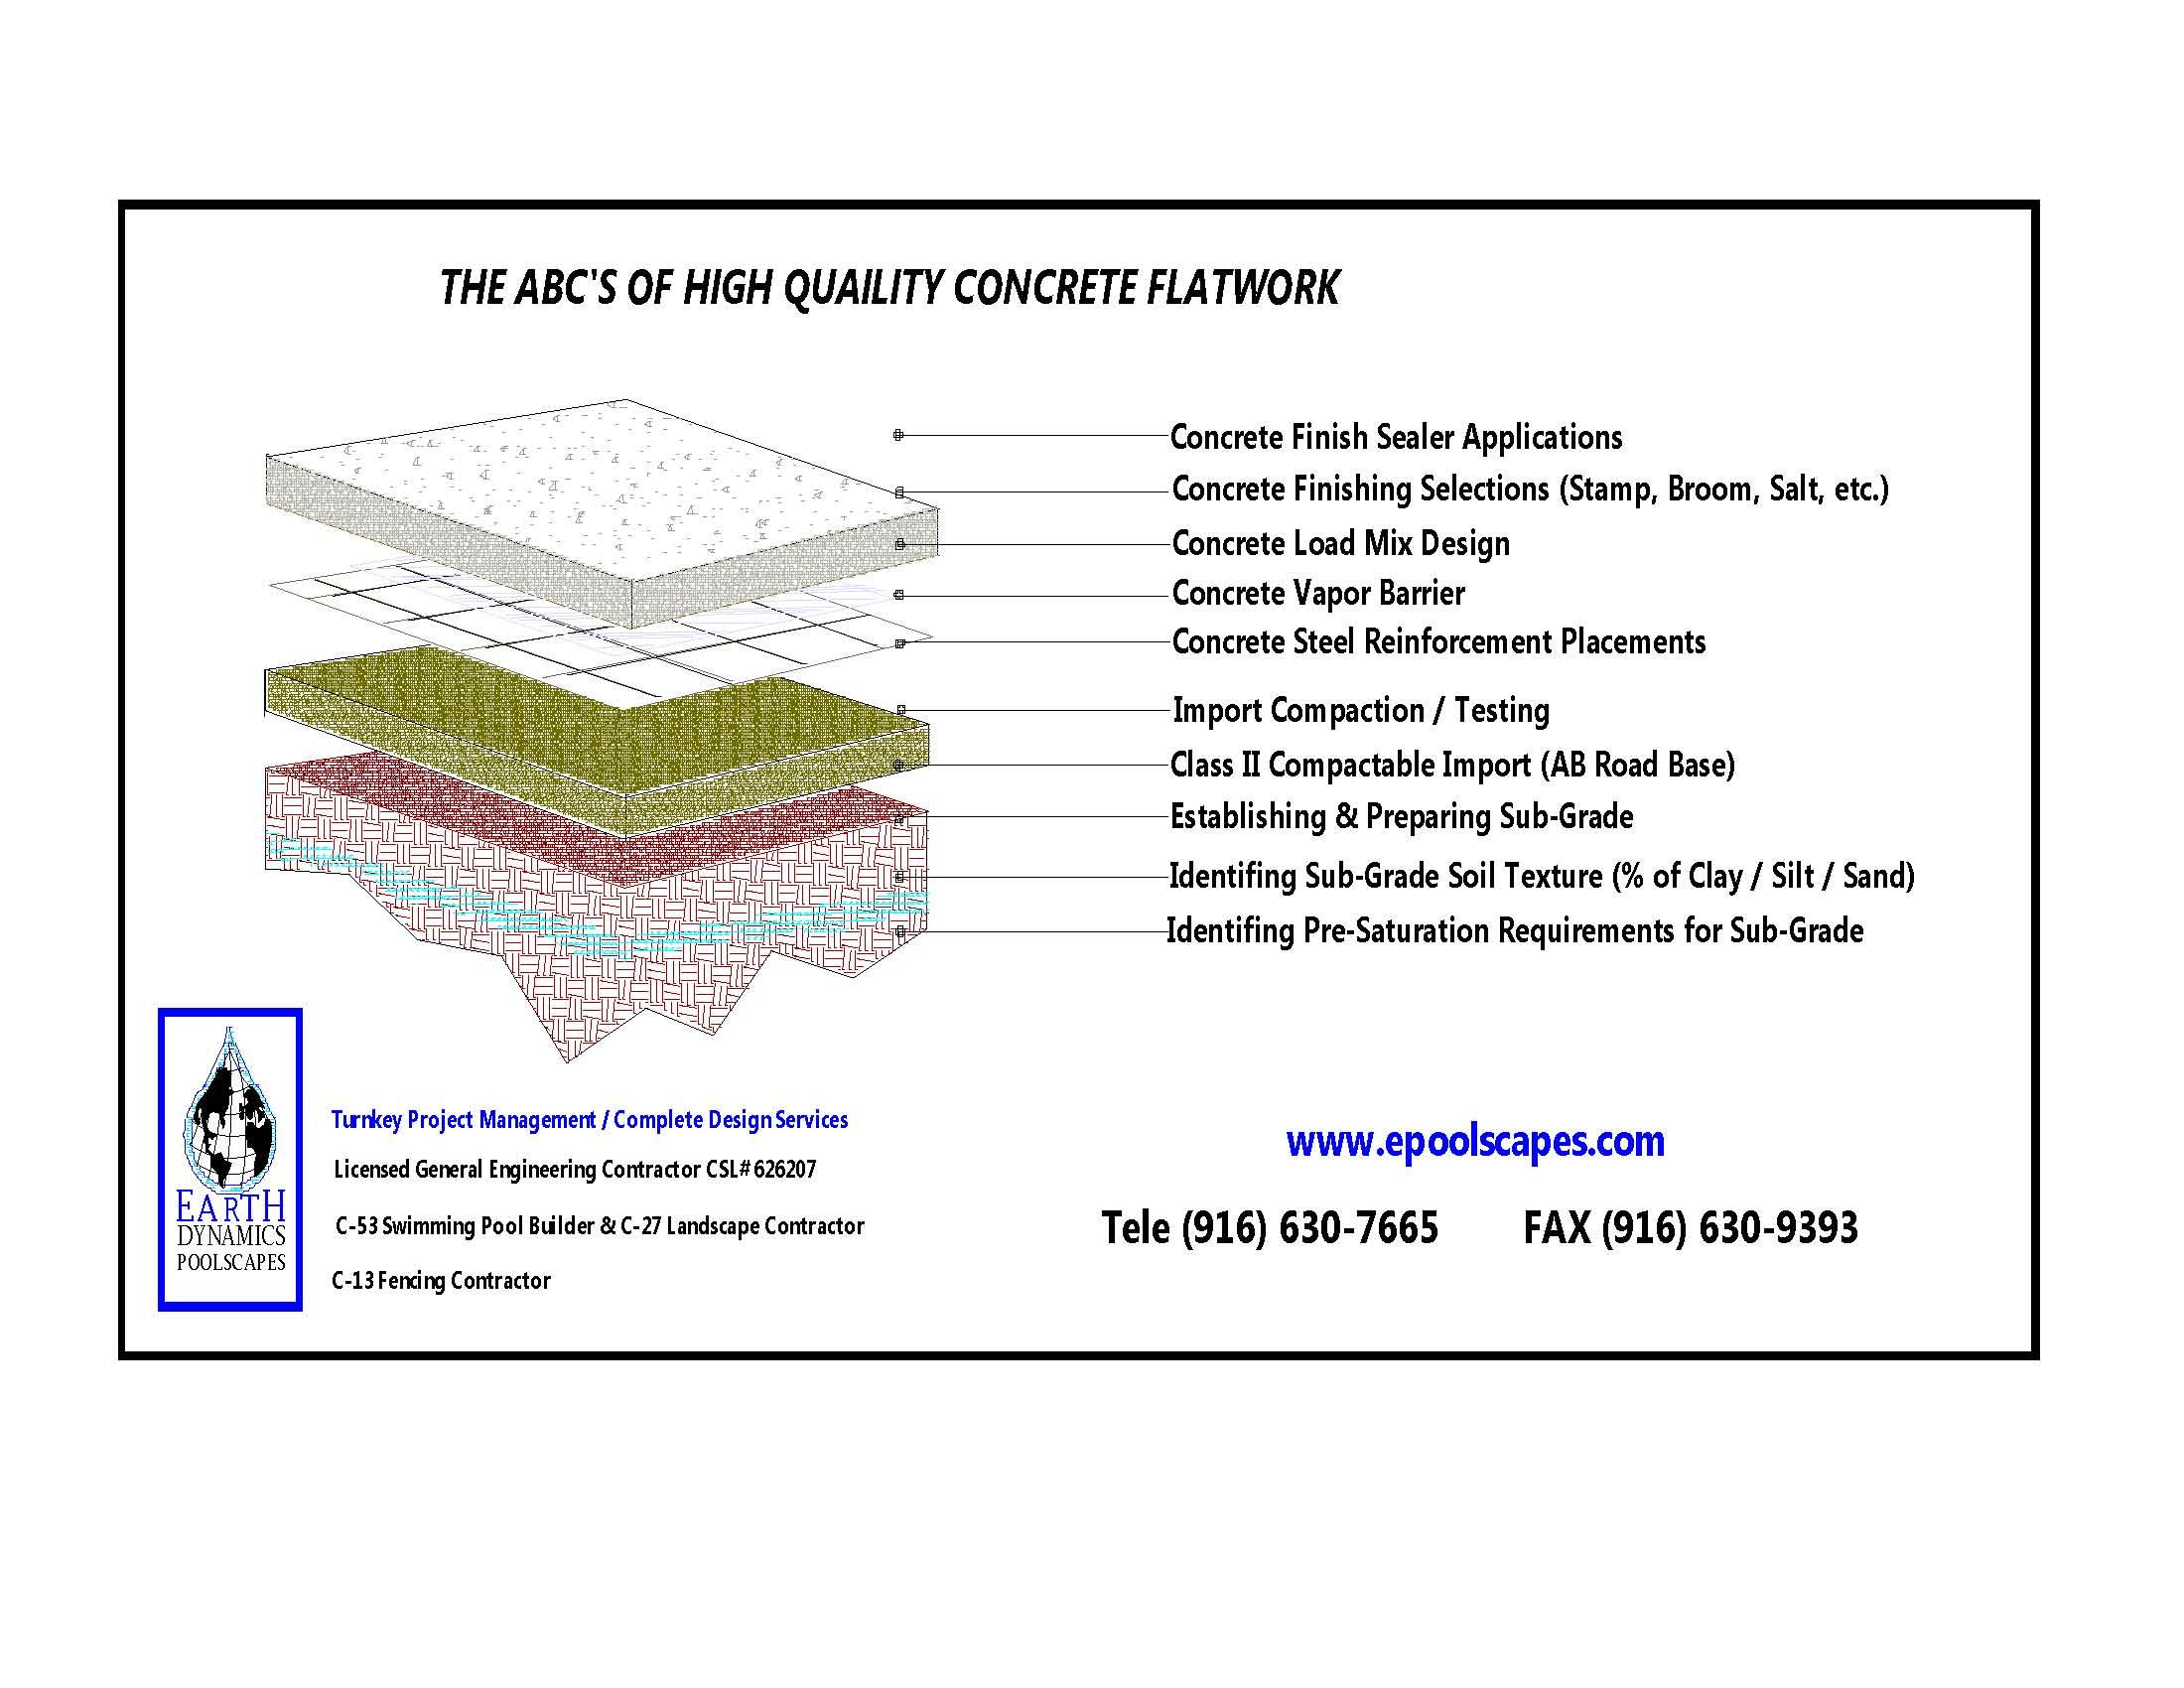 Elk Grove Landscape Installation Contractor 916 630